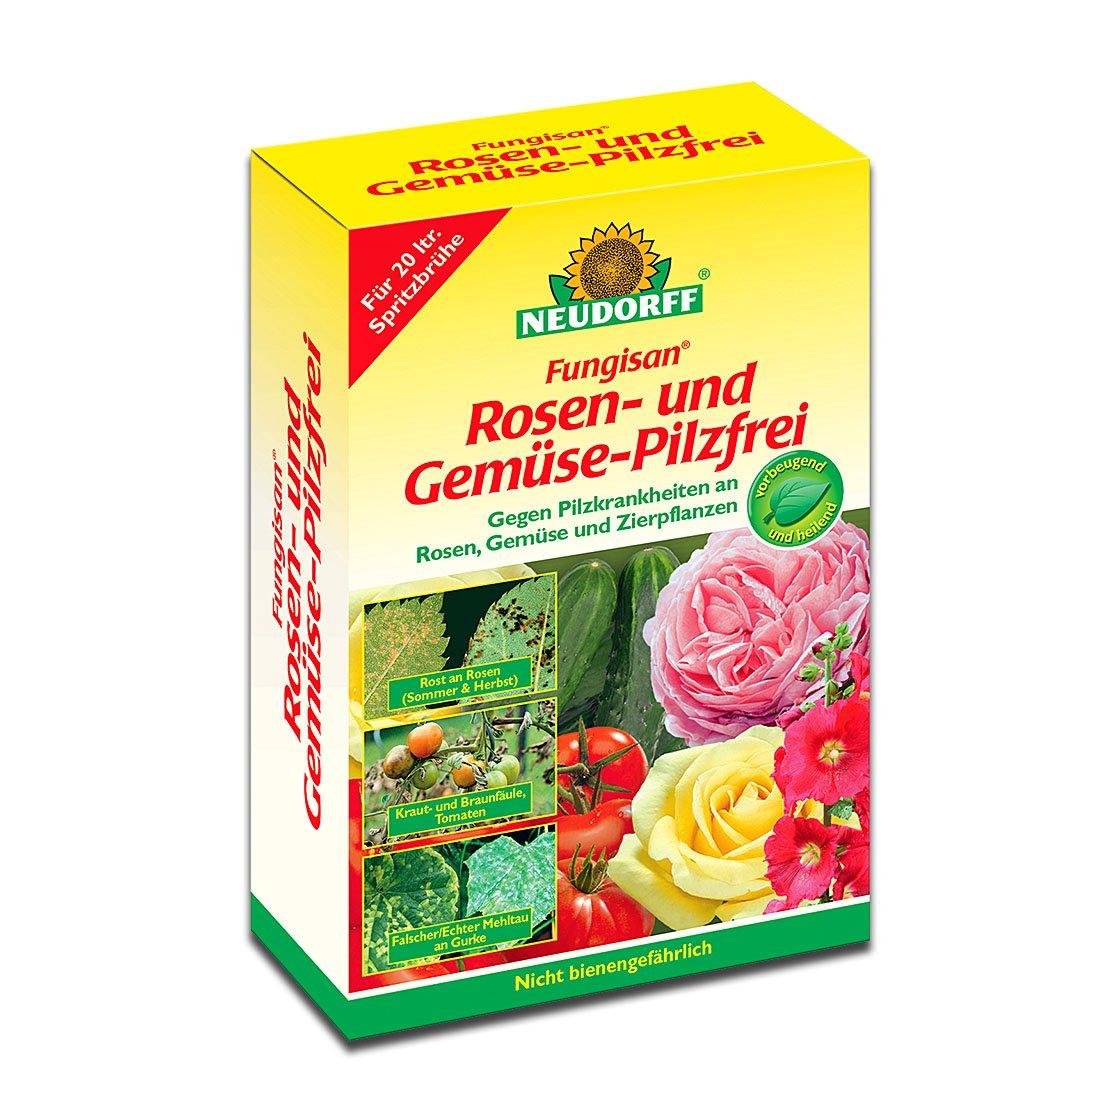 neudorff fungisan rosen und gem se pilzfrei gegen pilzkrankheiten fungizid rostkrankheiten. Black Bedroom Furniture Sets. Home Design Ideas